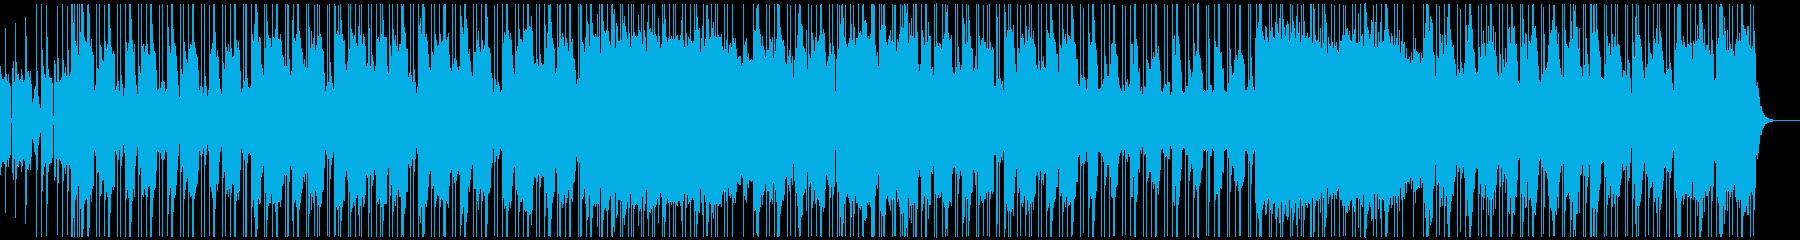 【ROCK】嵐の前の静けさの再生済みの波形